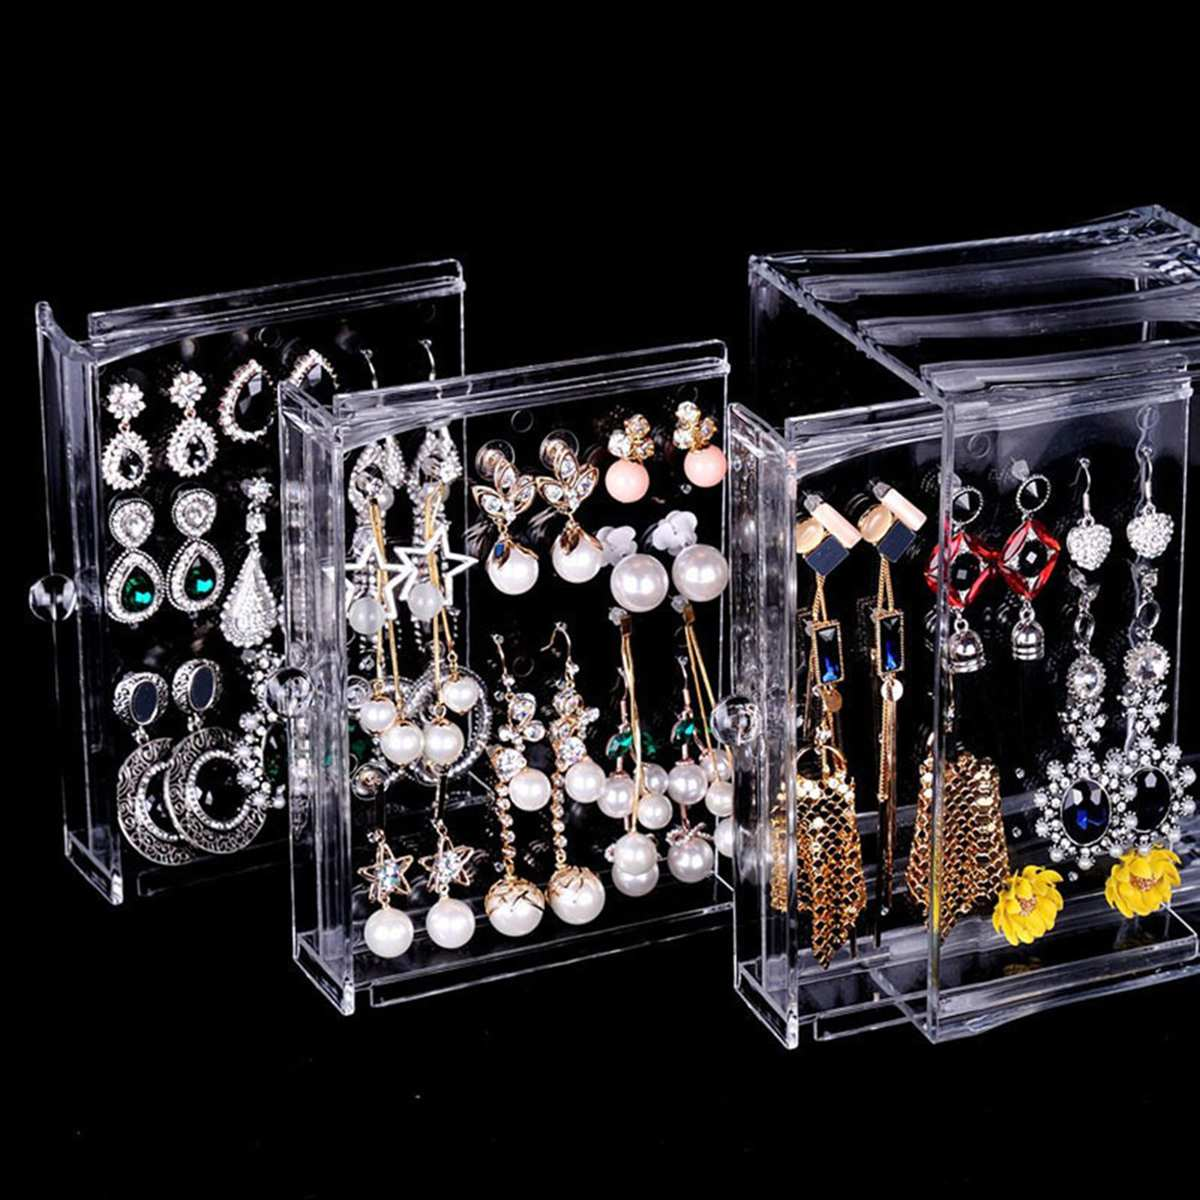 Caja de almacenamiento transparente para pendientes, soporte organizador para pendientes, soporte para pernos con cajón para organización de joyas, caja de anillos de acrílico